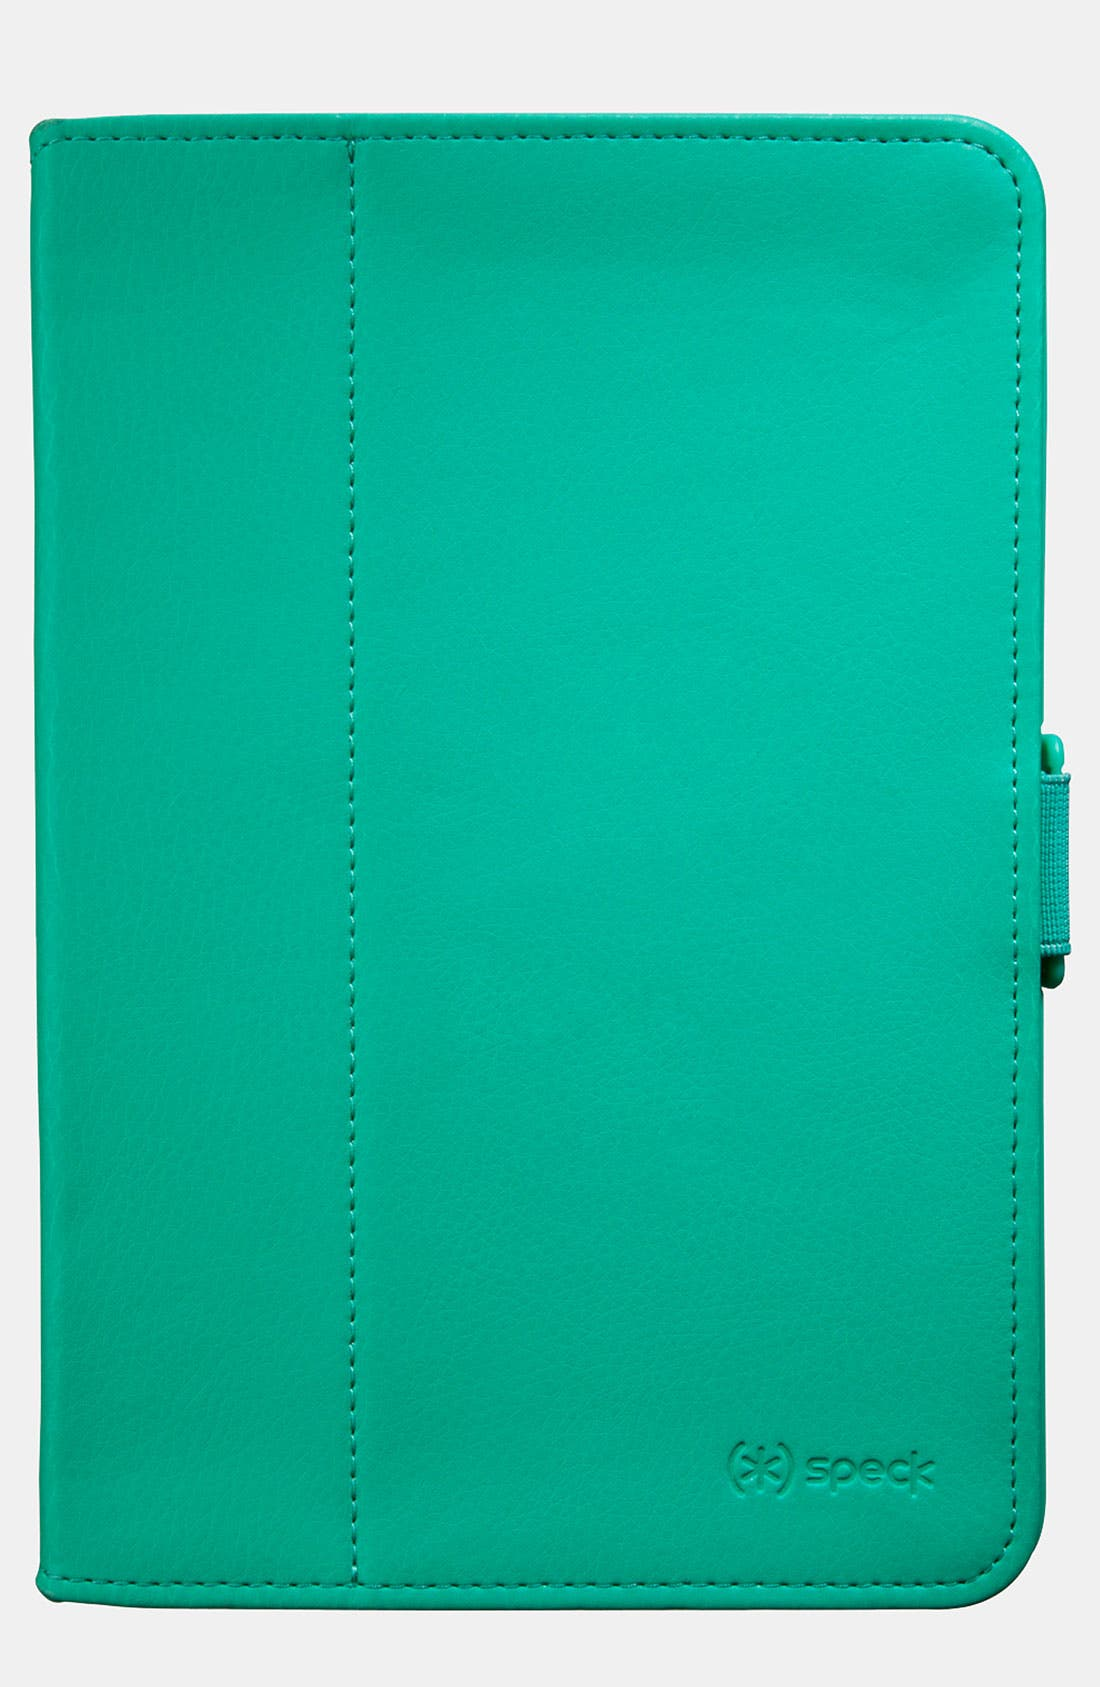 Alternate Image 1 Selected - Speck 'FitFolio' iPad mini Case